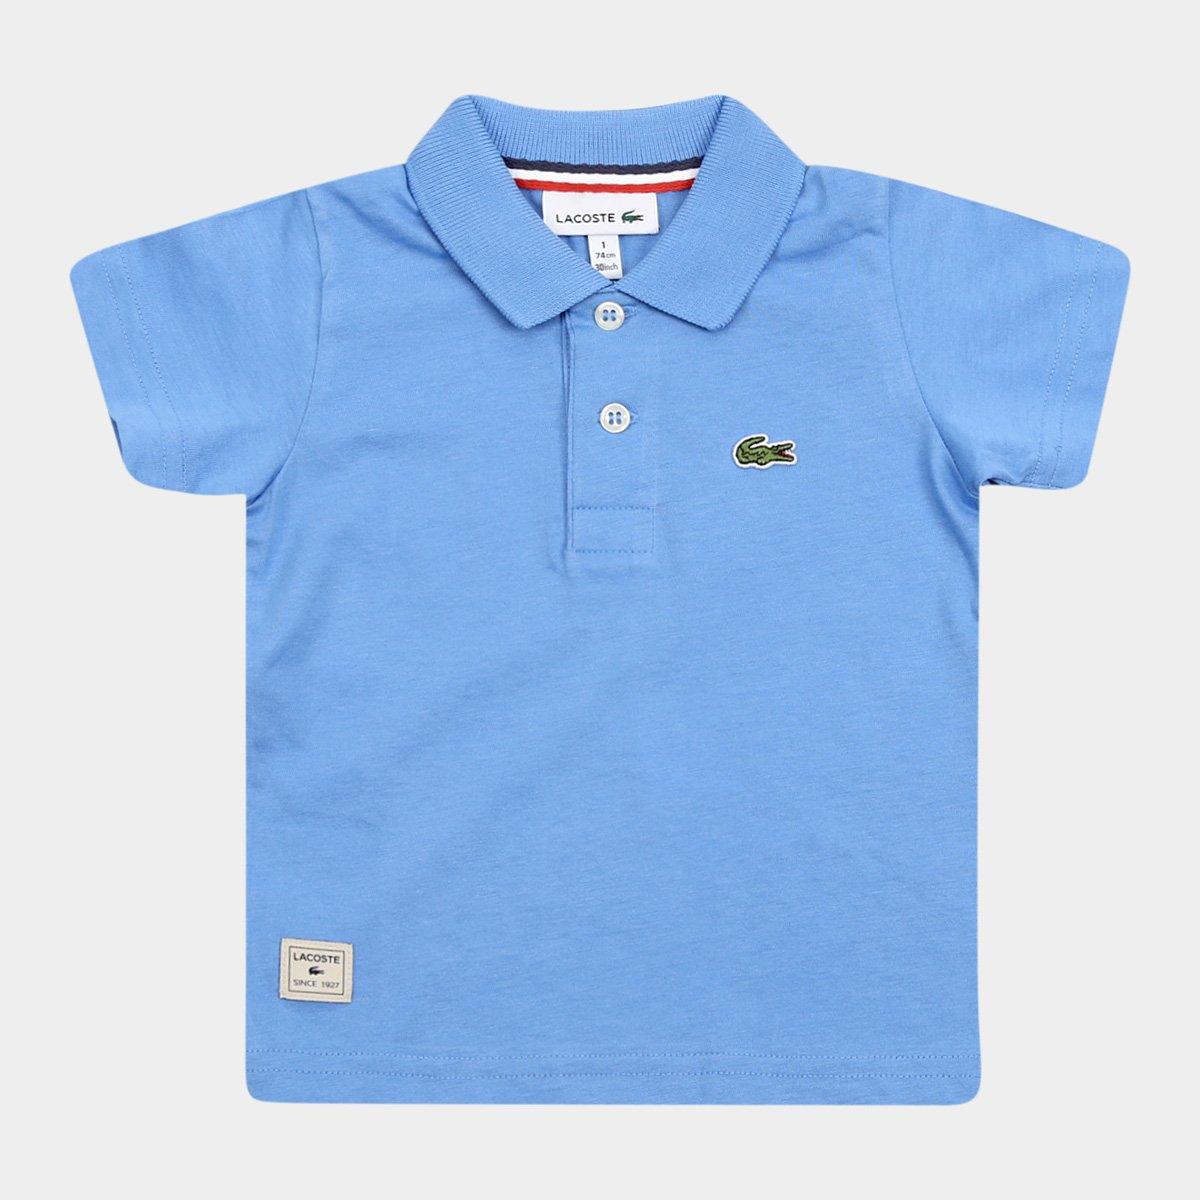 4f6fec8926 Camisa Polo Infantil Lacoste Masculina - Compre Agora